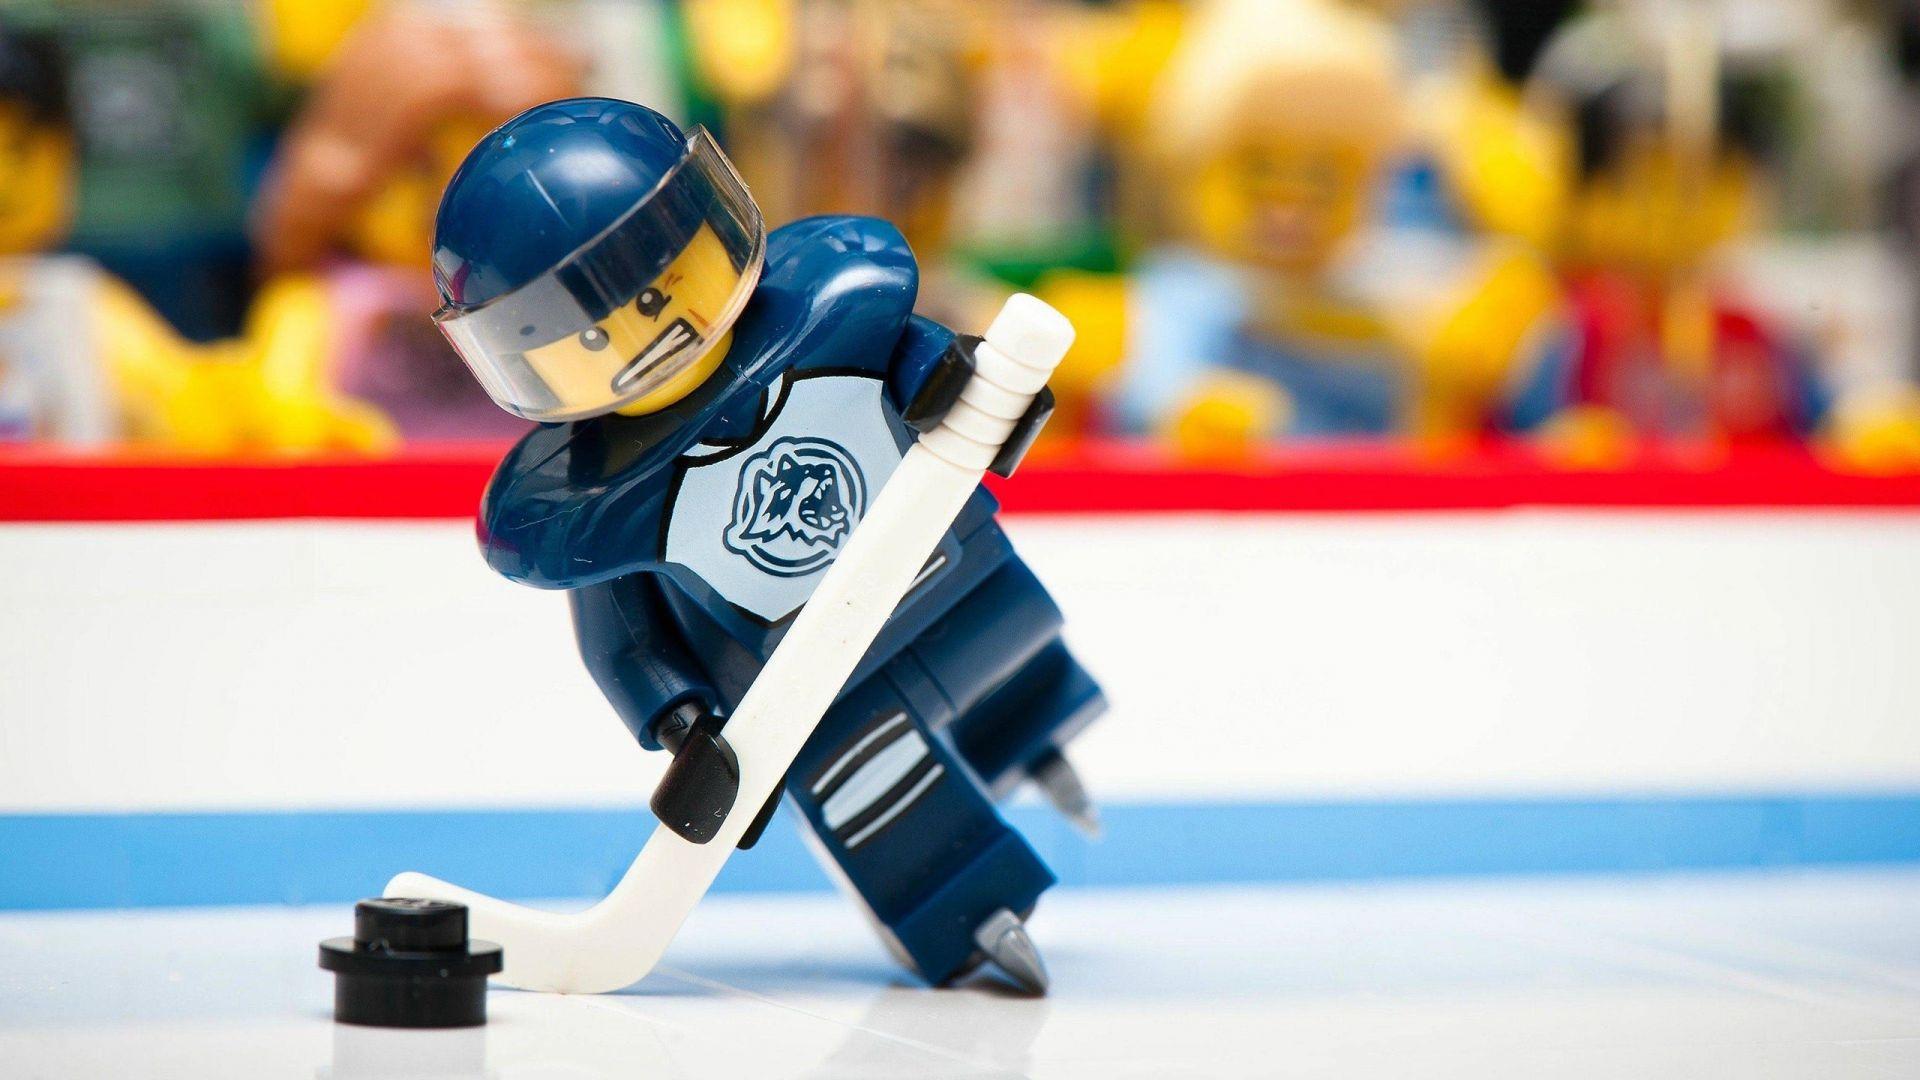 Wallpaper Lego toys of hockey player